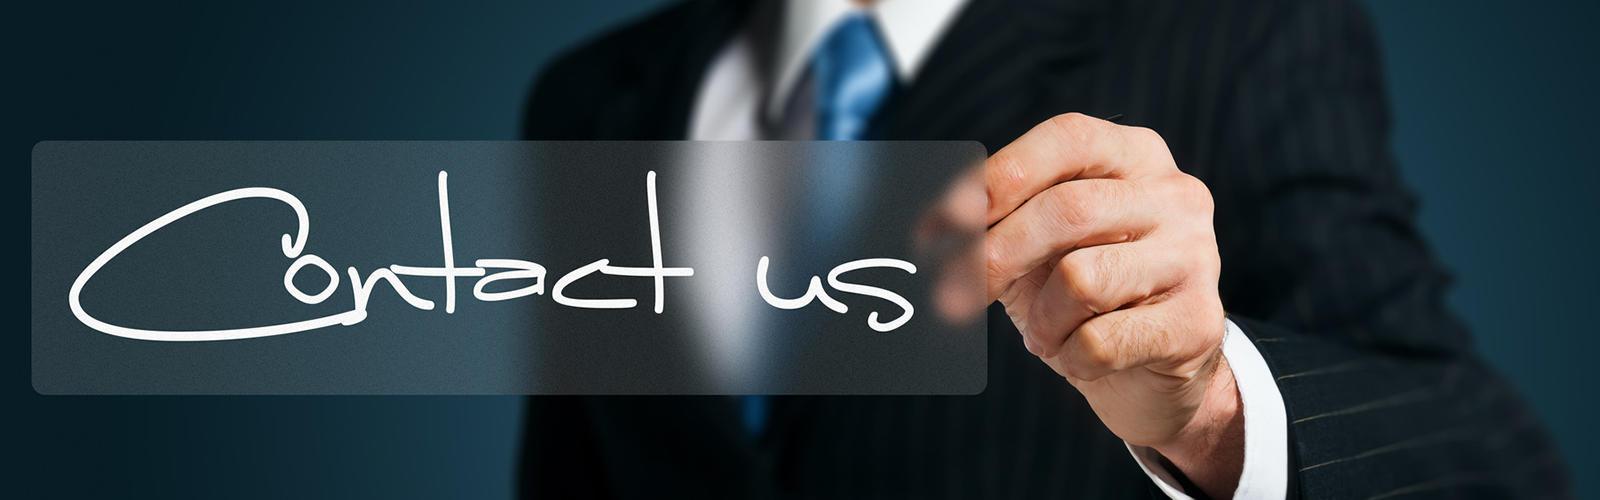 Cypress RV Sales image 8